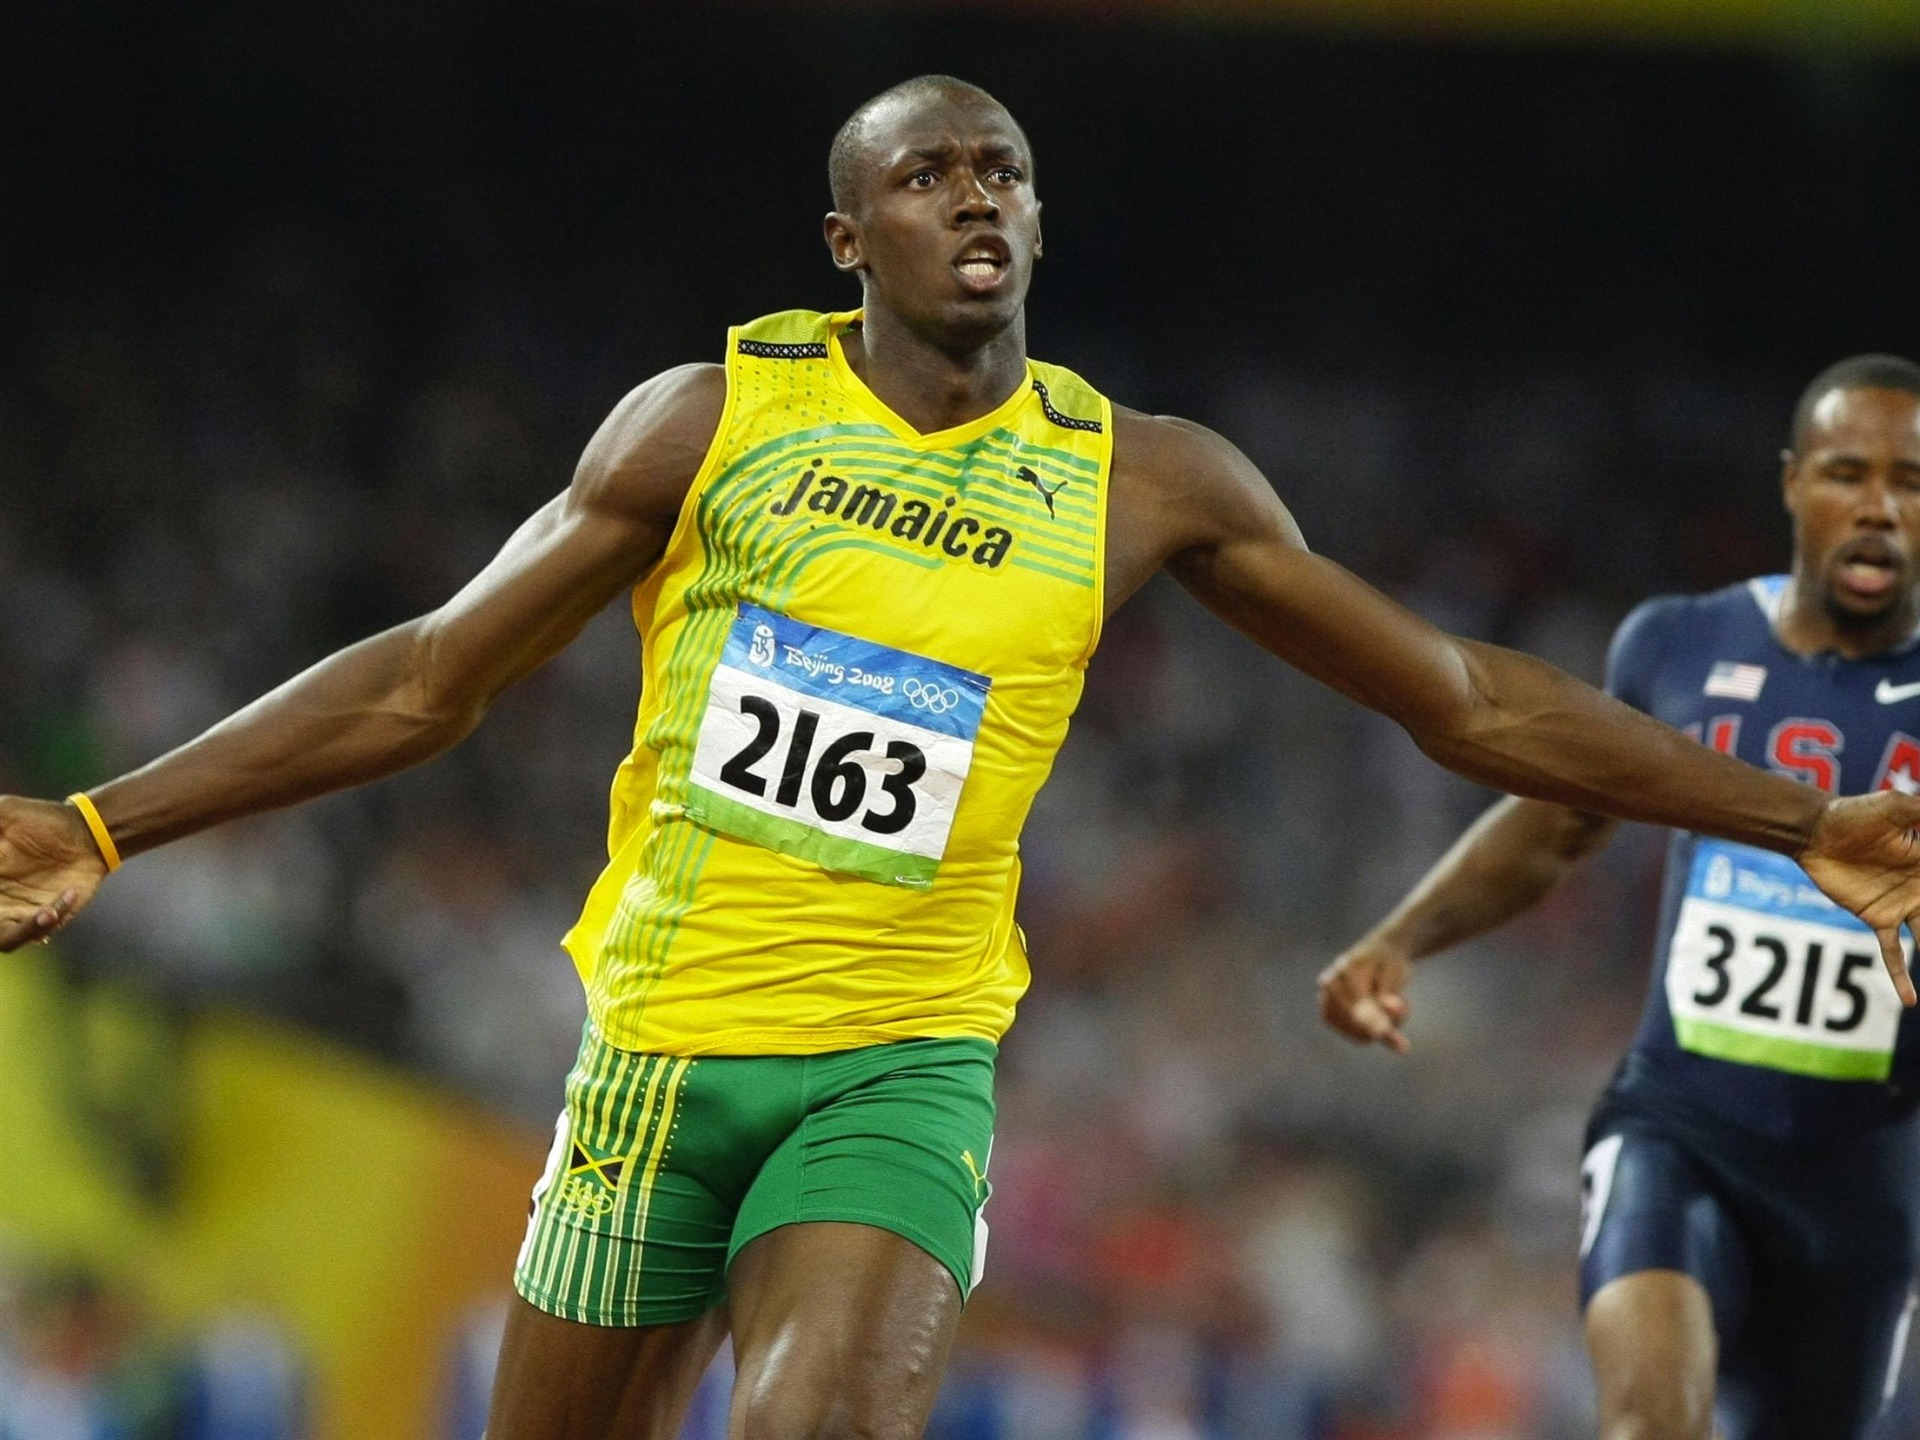 Usain Bolt-London 2012 - 1920x1440 wallpaper download -10wallpaper.com